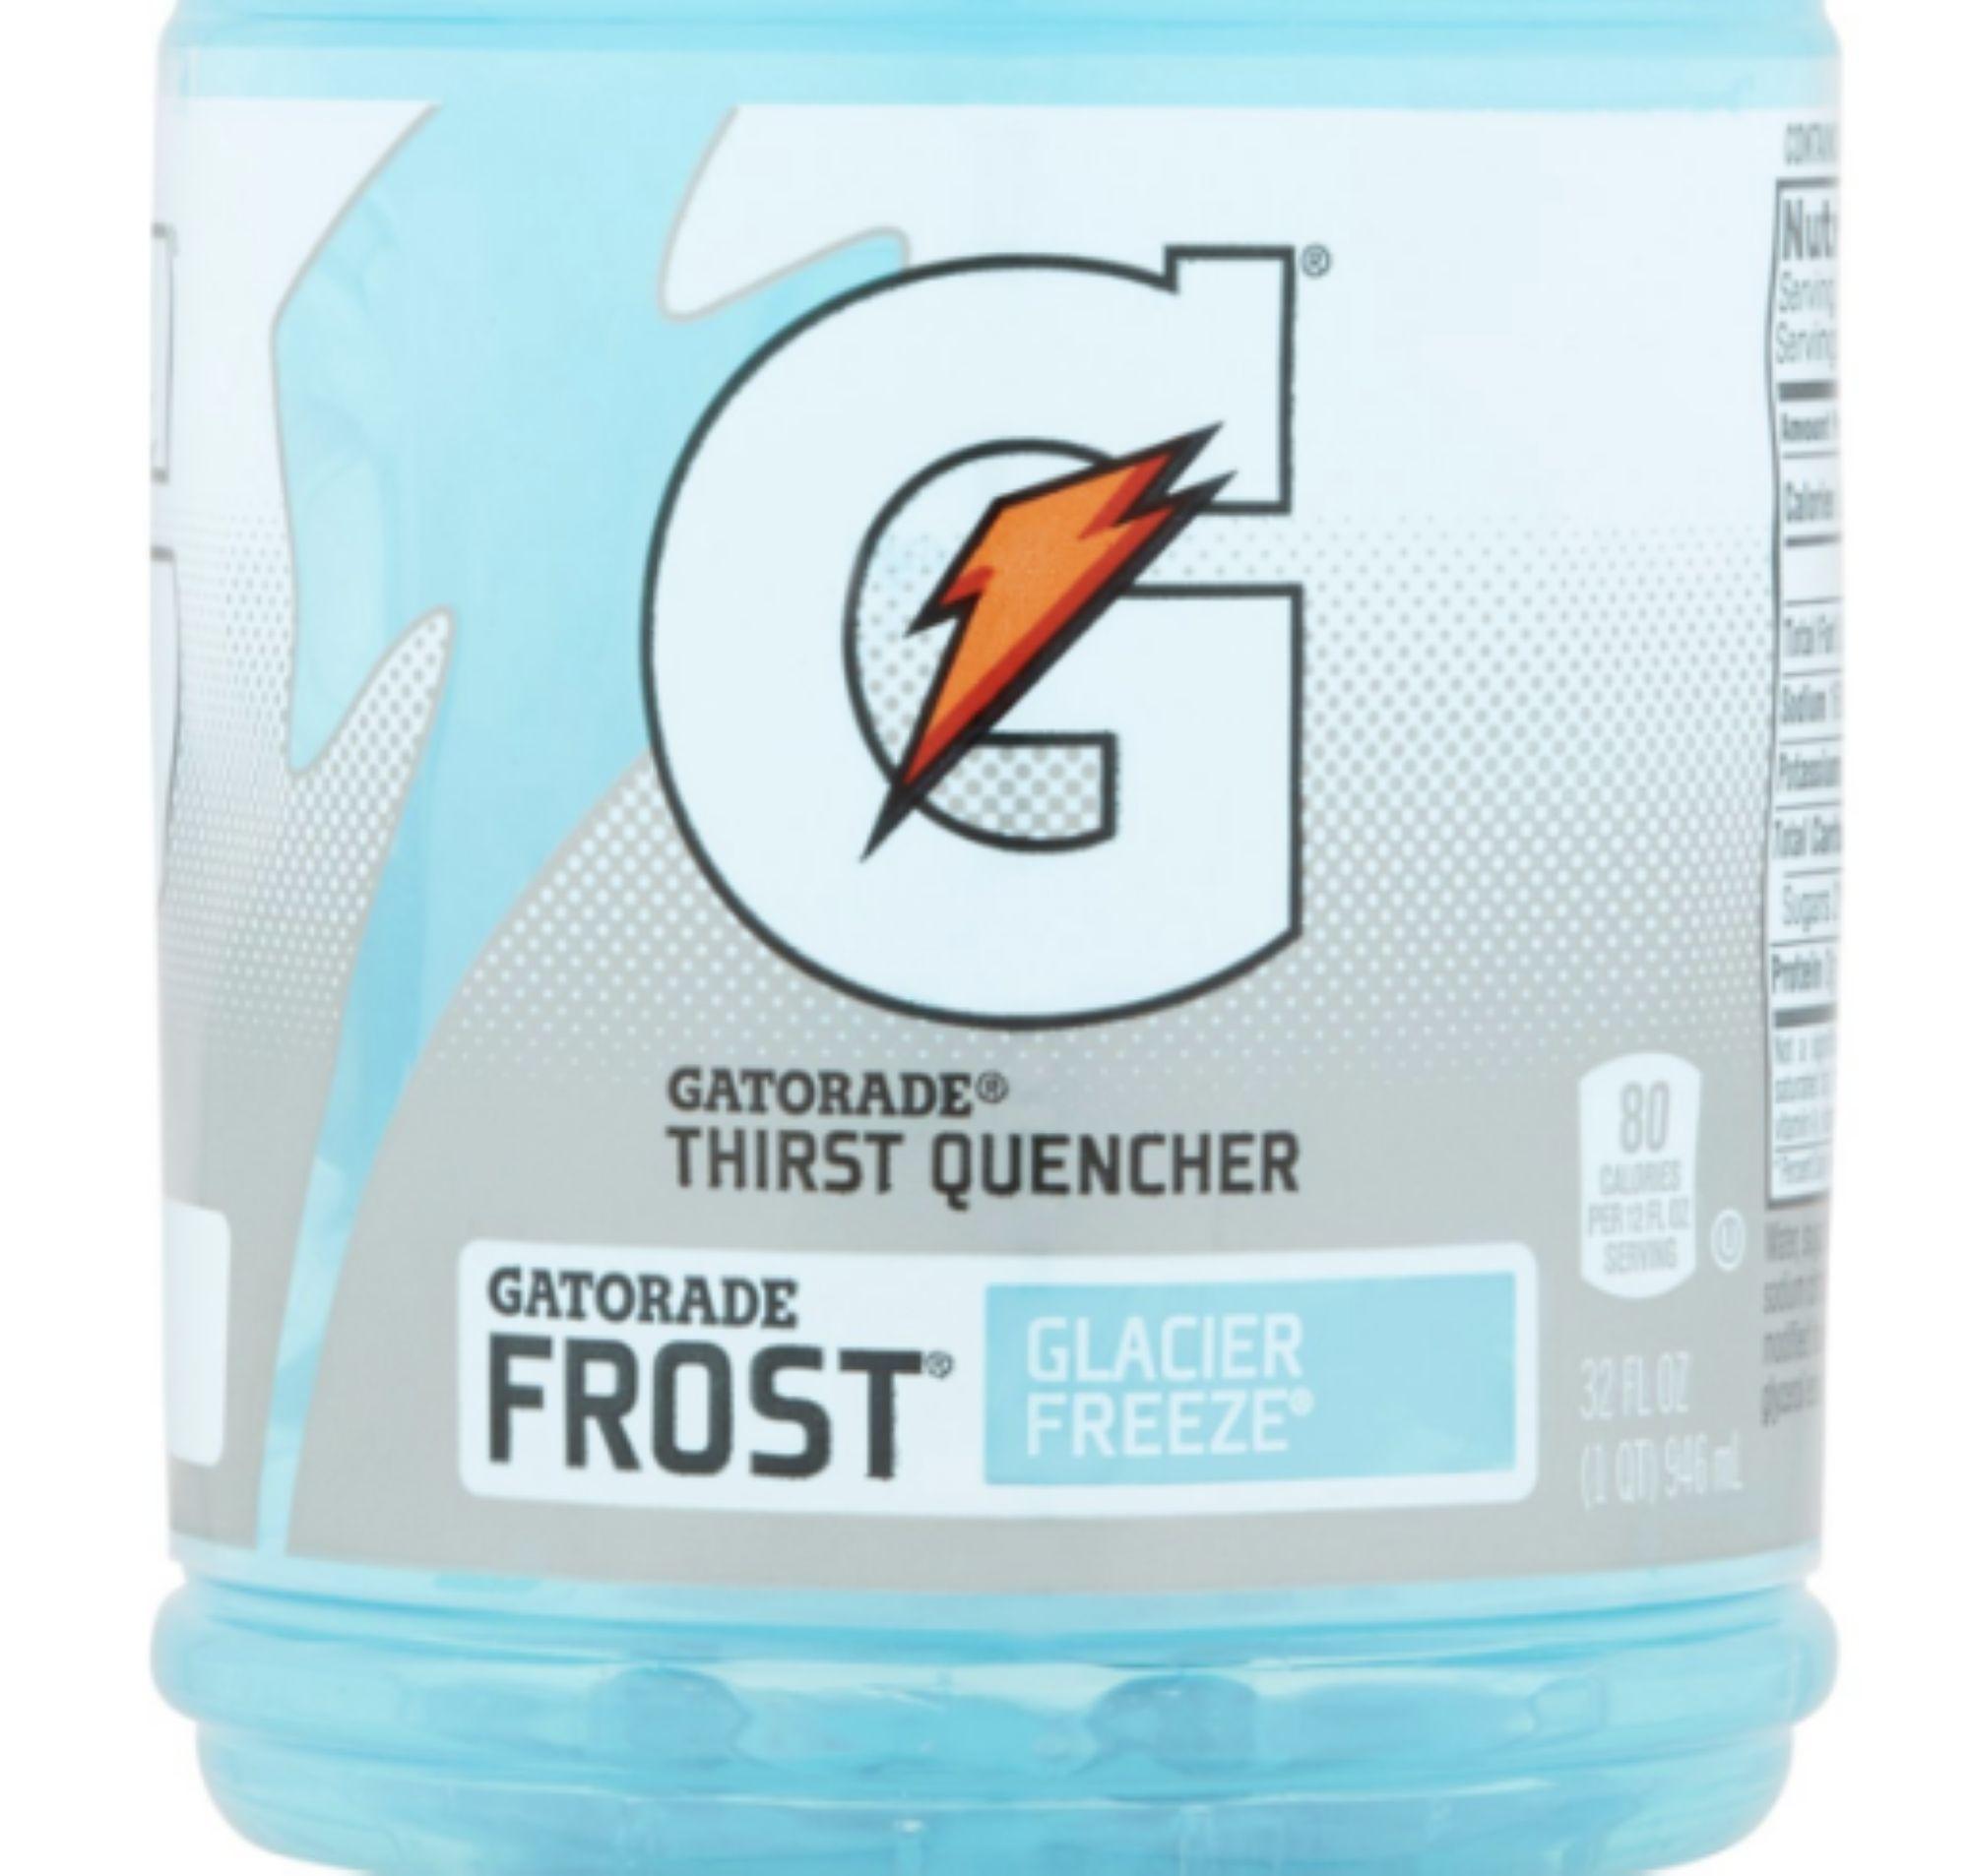 03-Gatorade-Frost-close-up